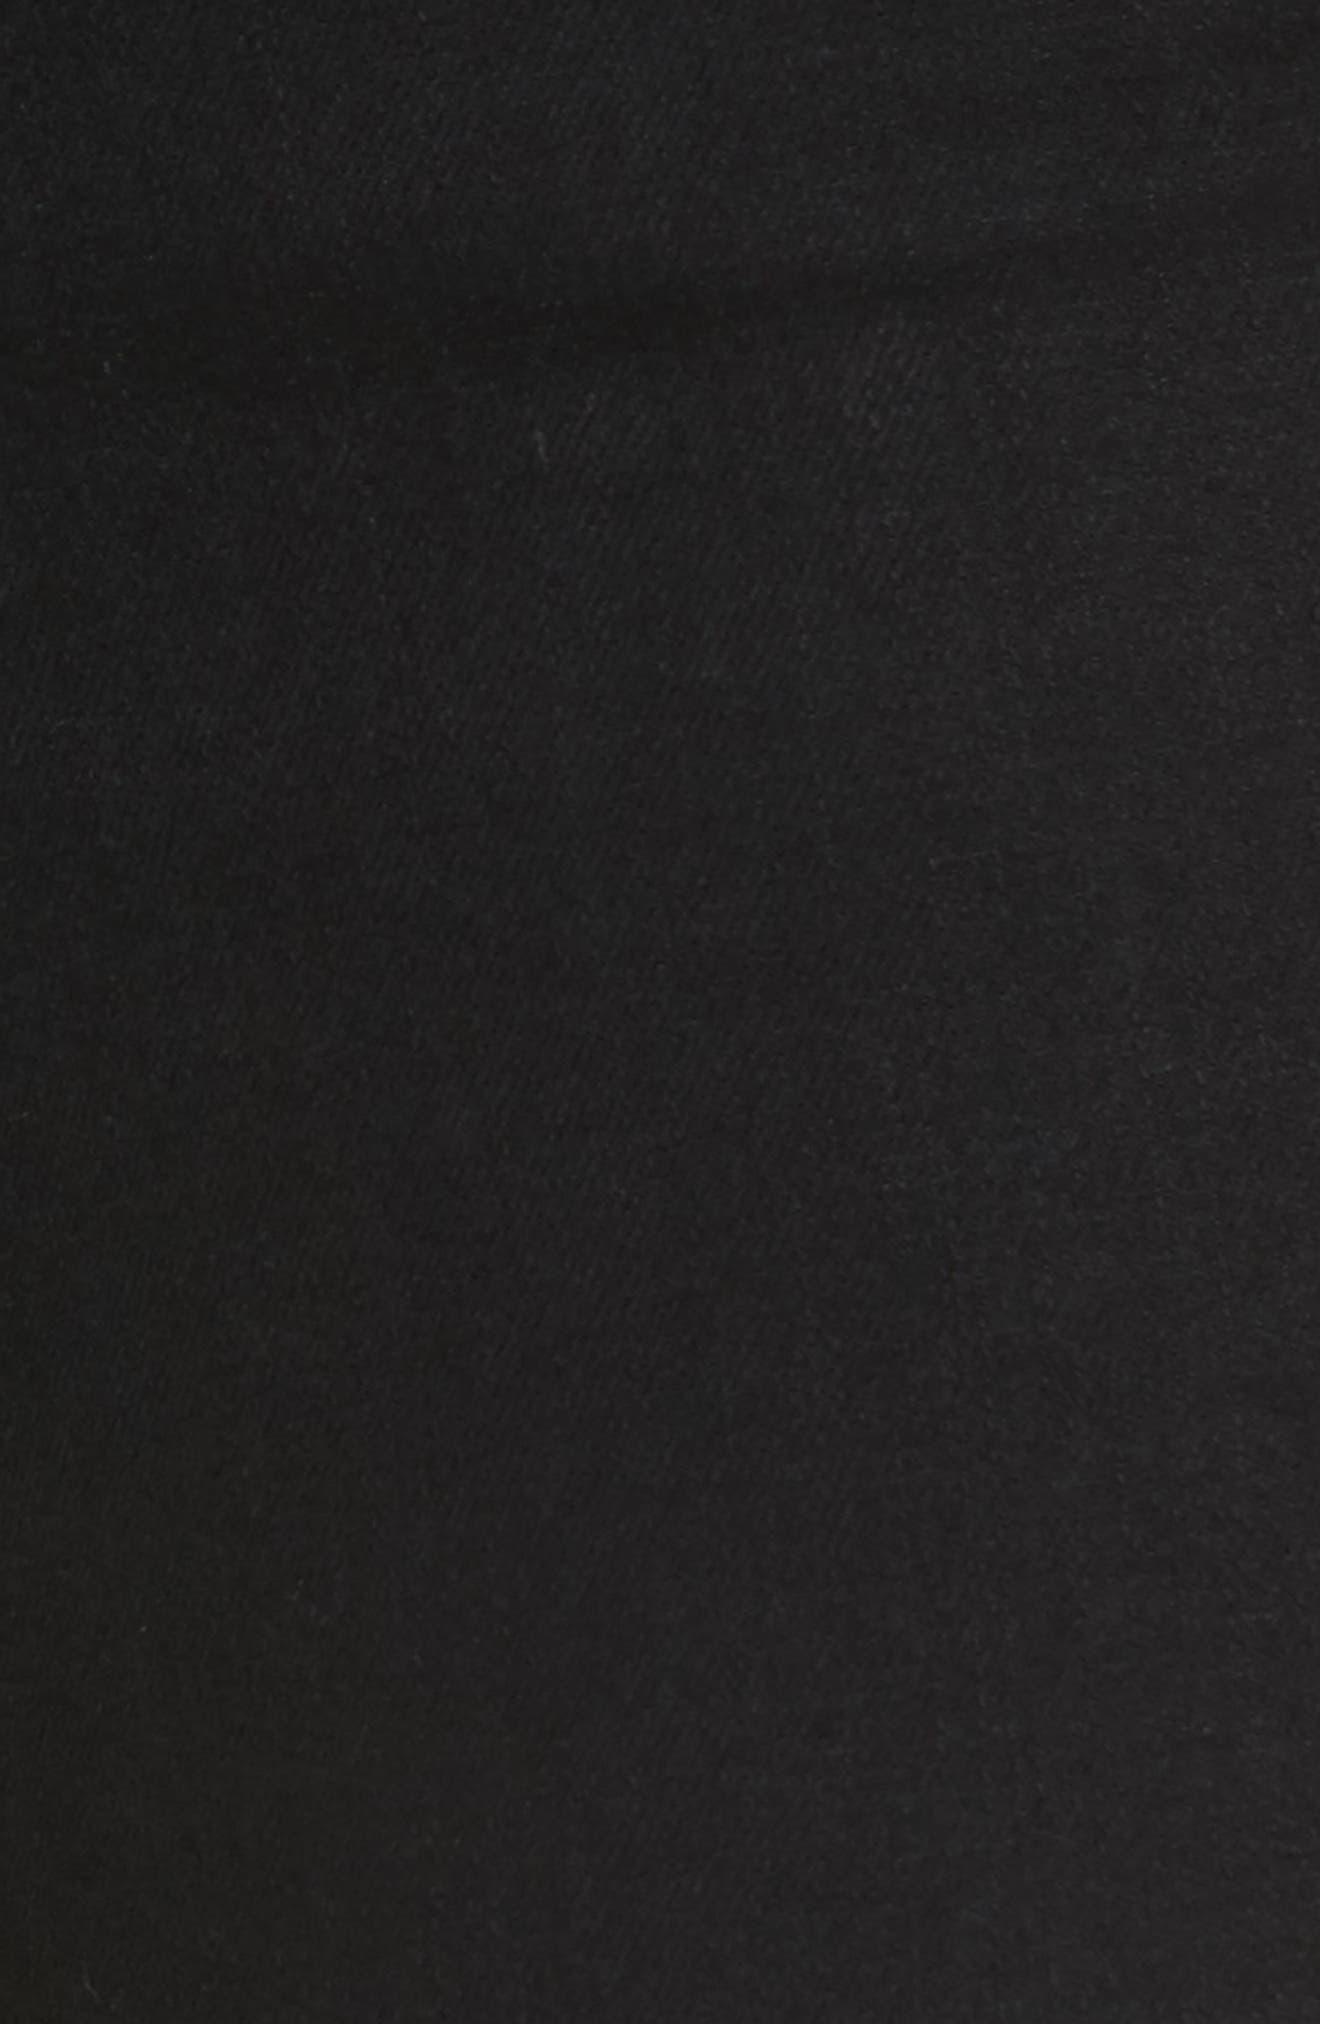 W2 Crop Skinny Jeans,                             Alternate thumbnail 5, color,                             Black Tear